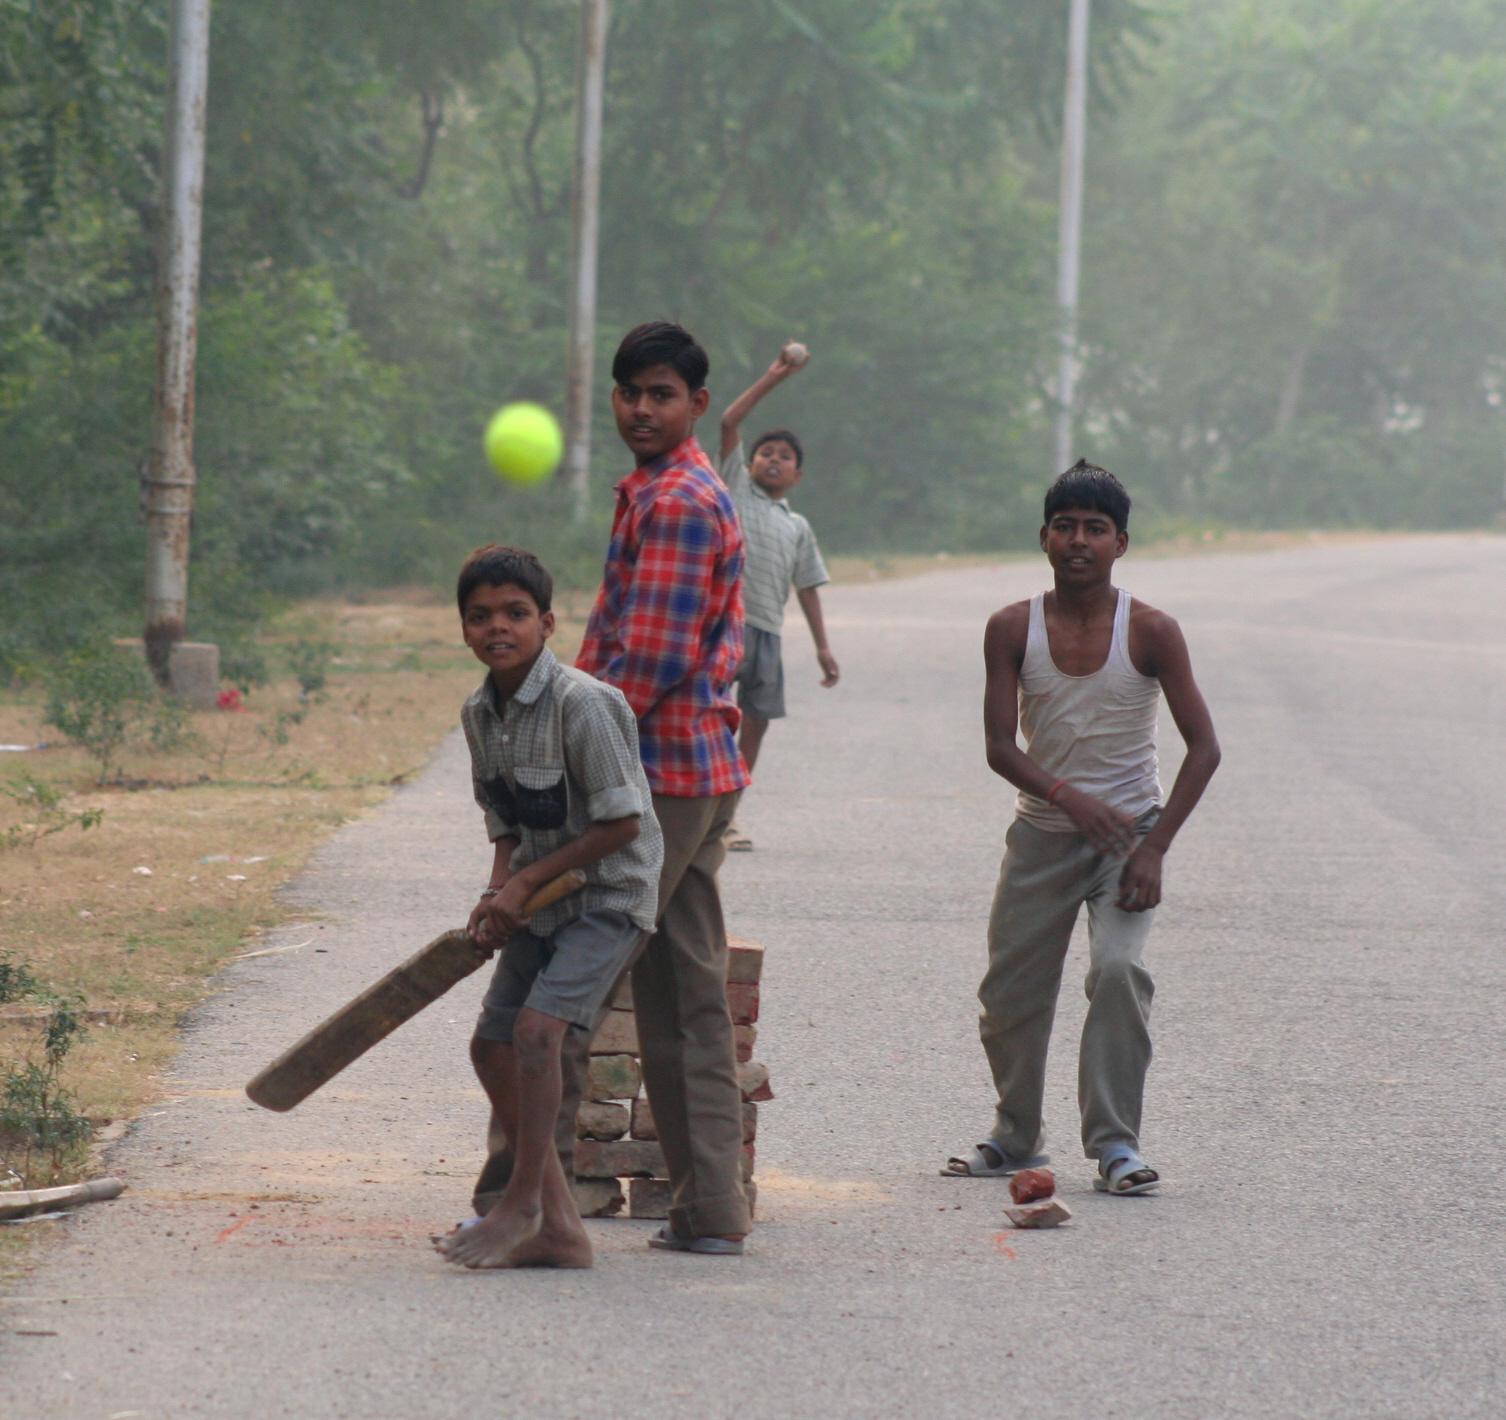 Cricket-Diät-Tabelle pdf